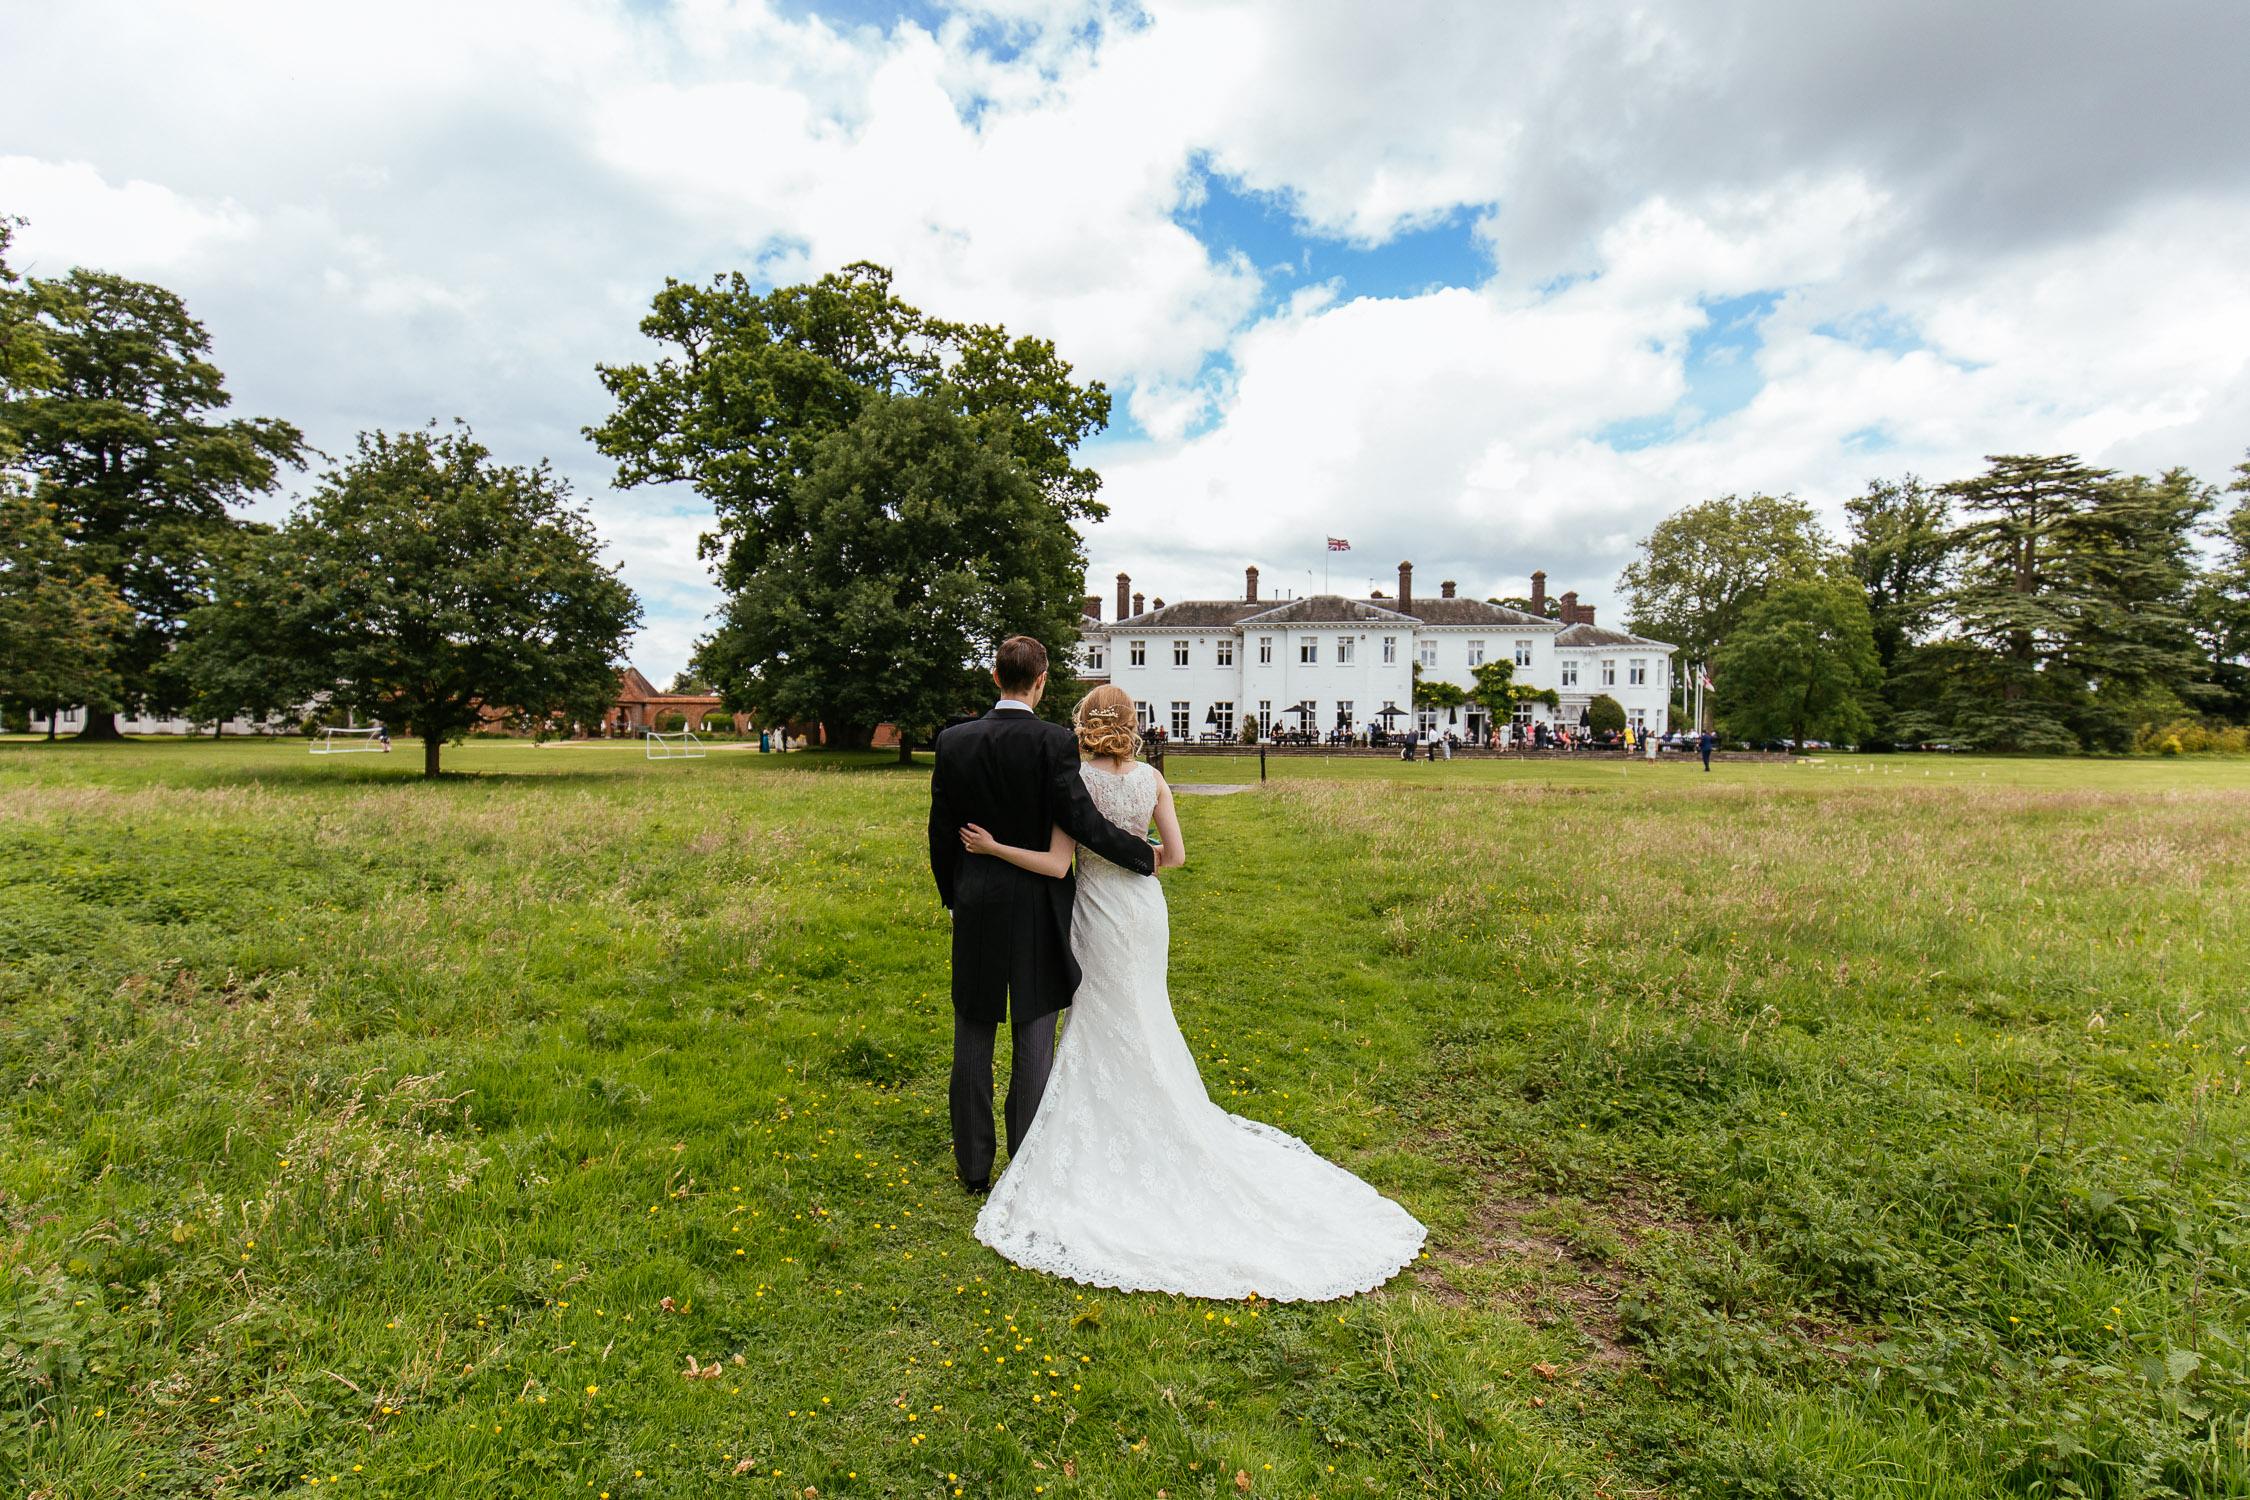 Lizi-and-Mark-Wedding-Highlights-67.jpg